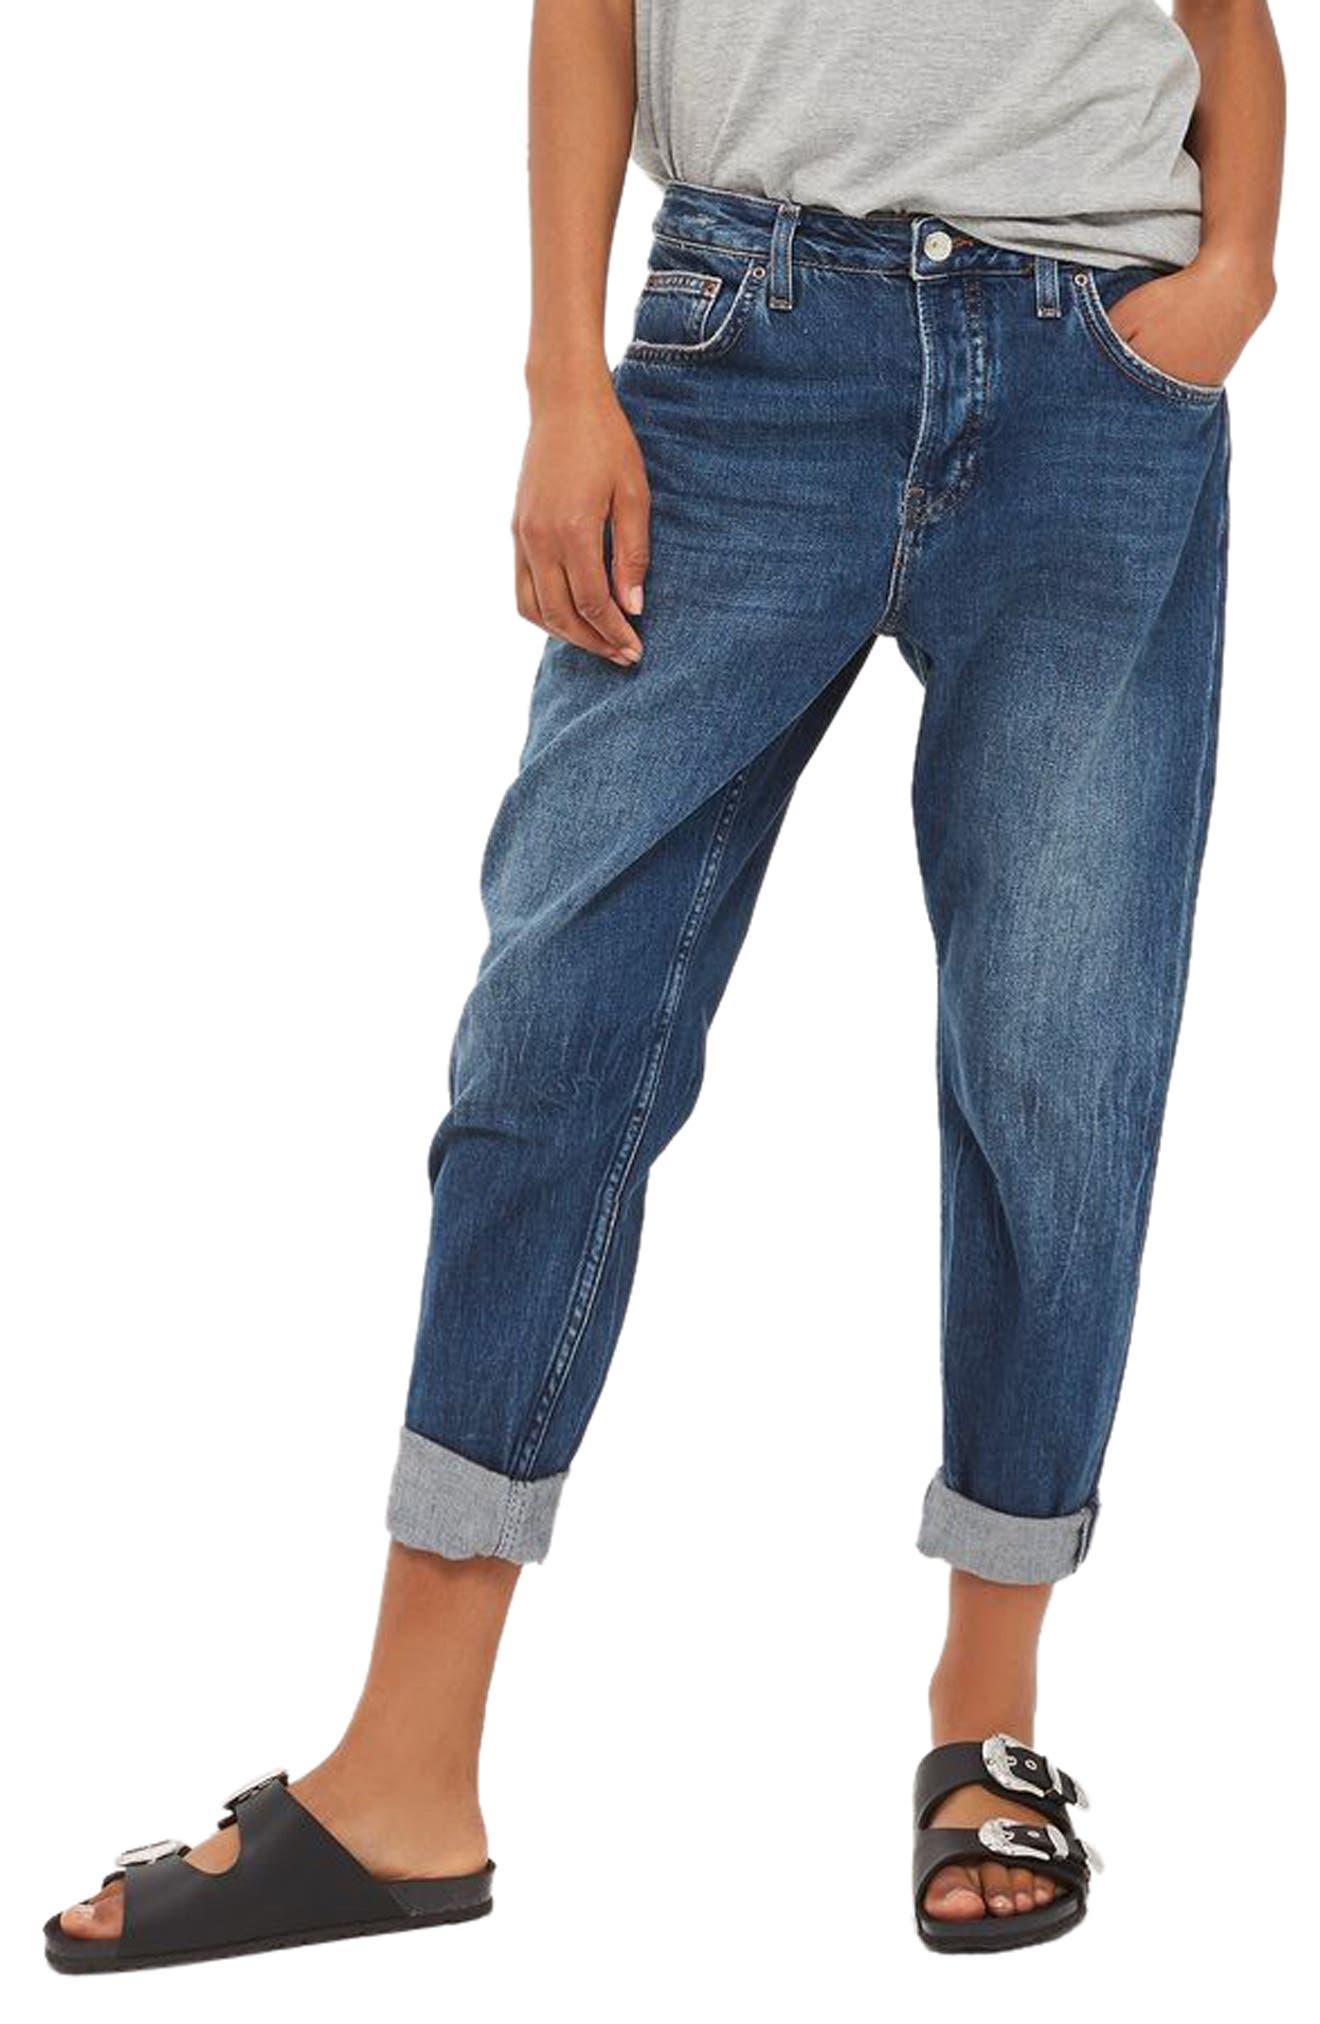 Topshop Hayden Boyfriend Jeans (Petite)